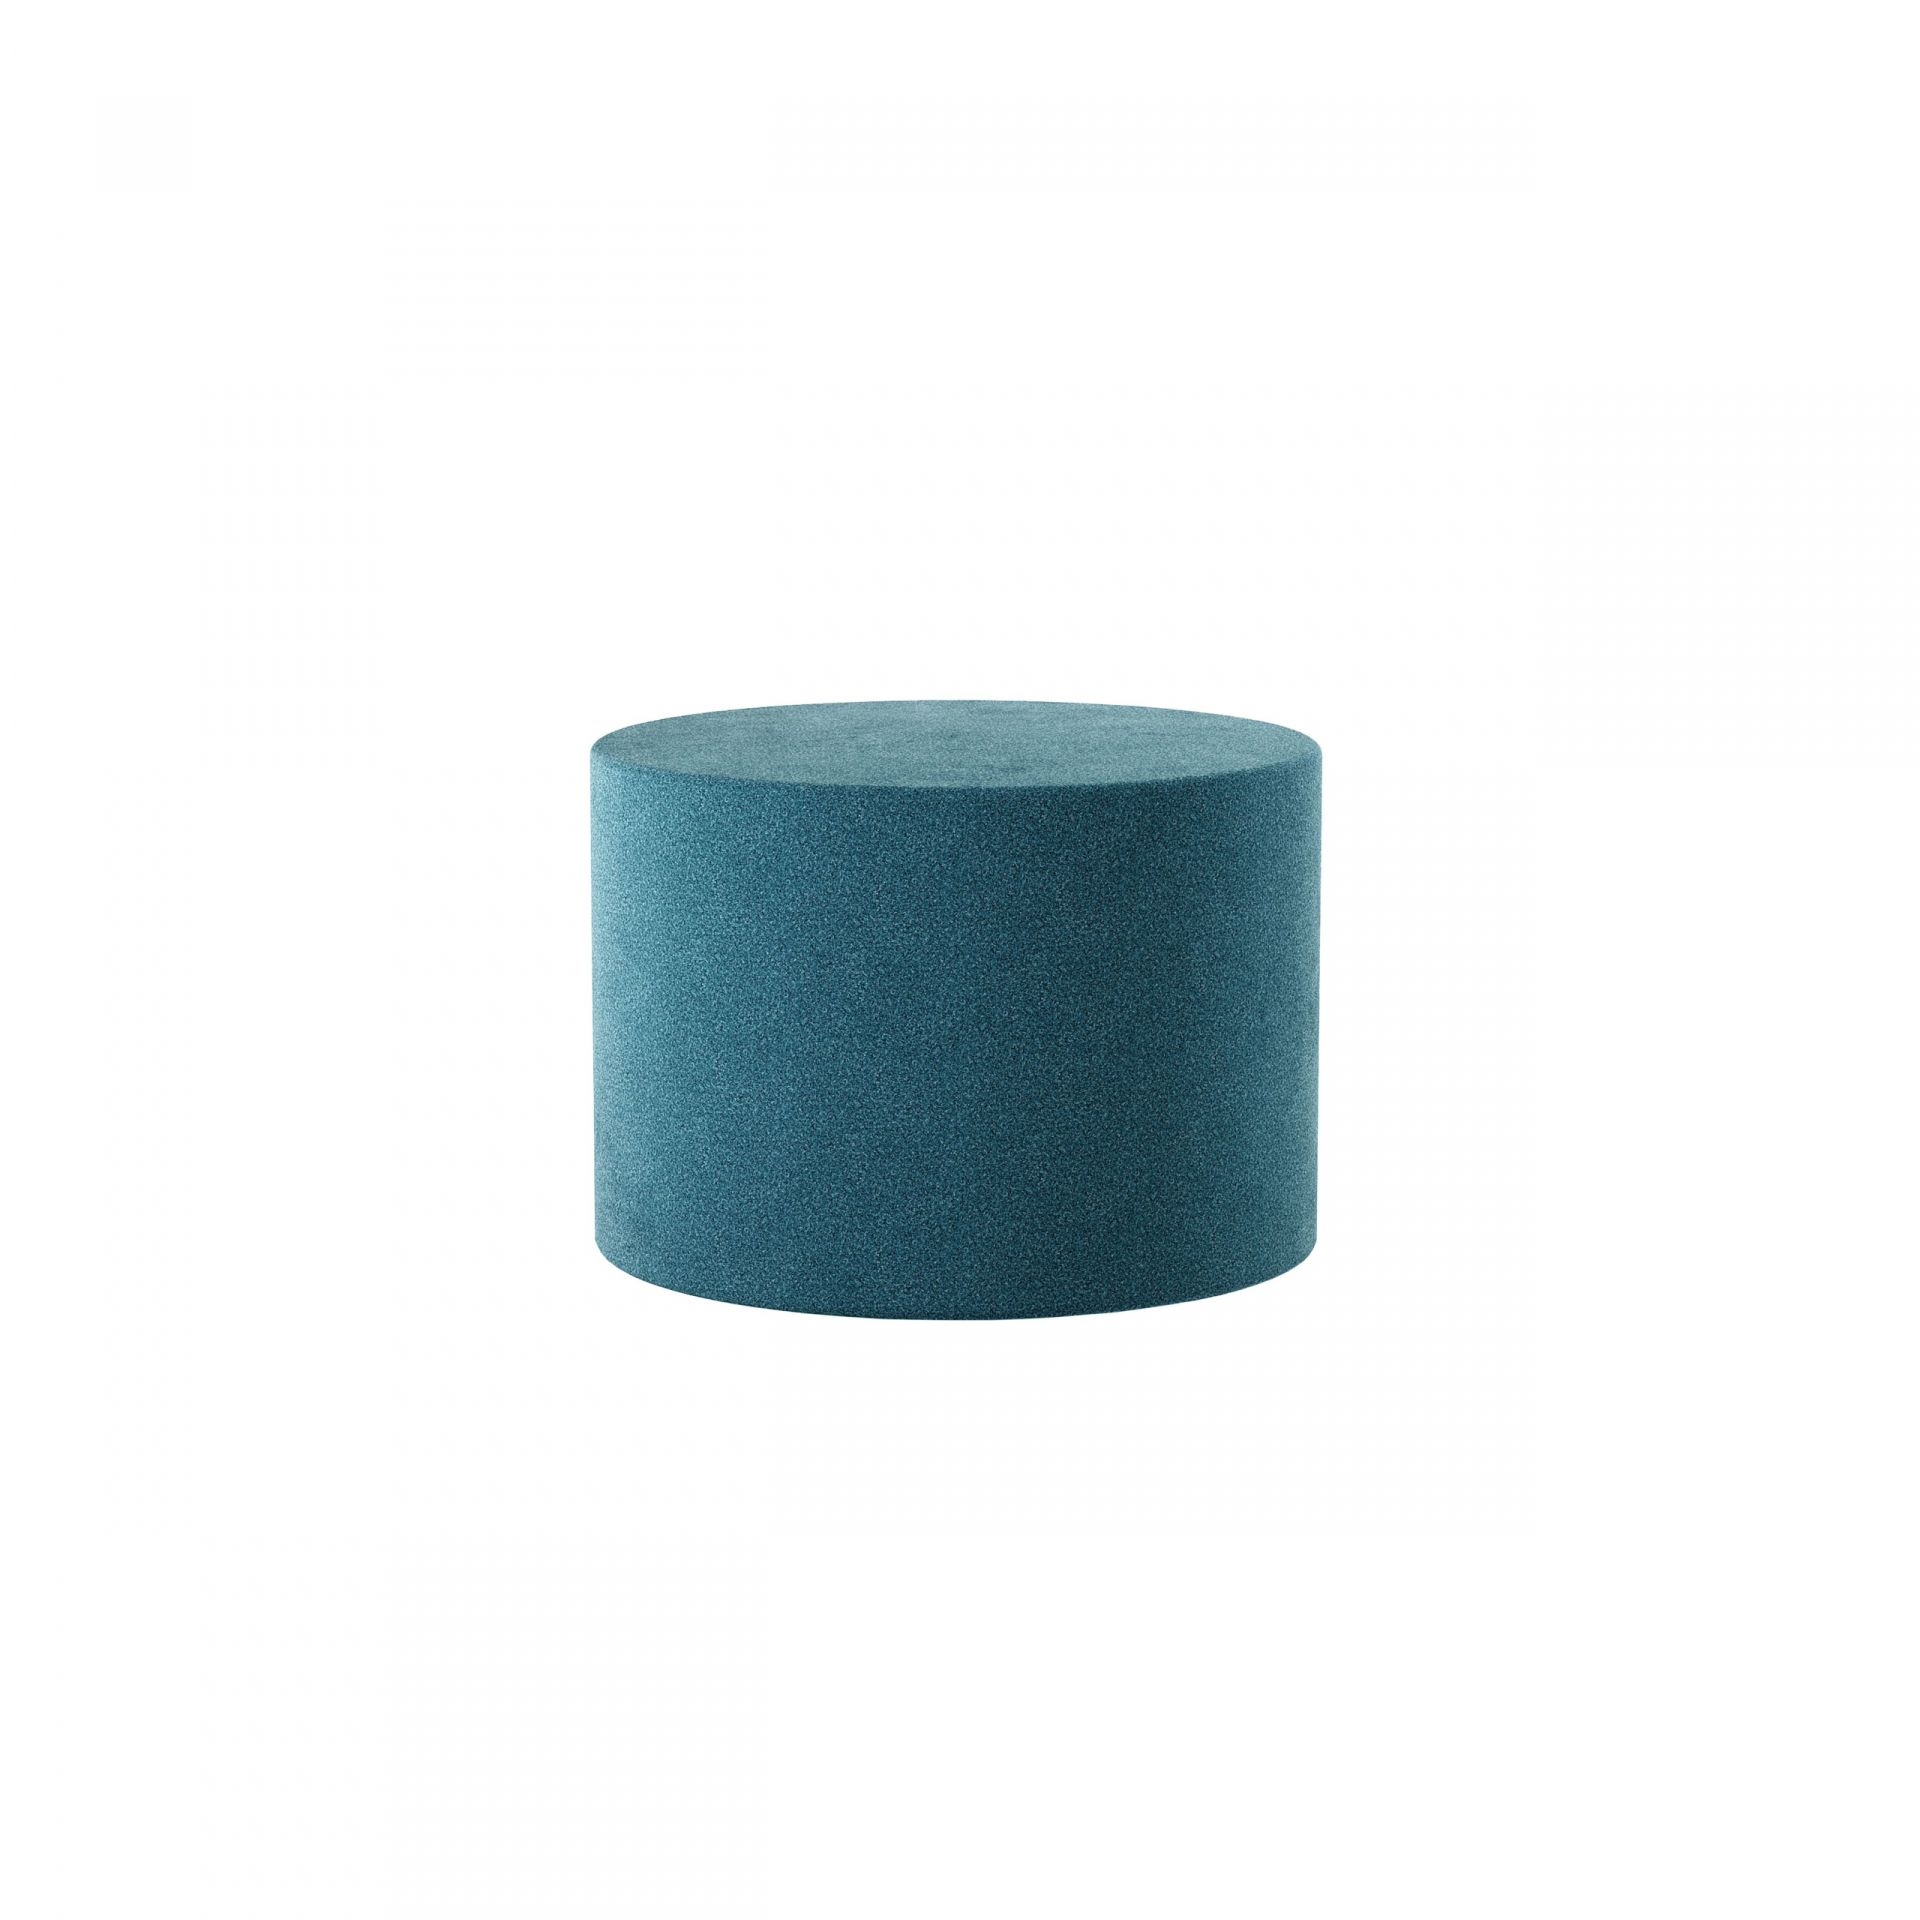 Bold Pouf product image 2